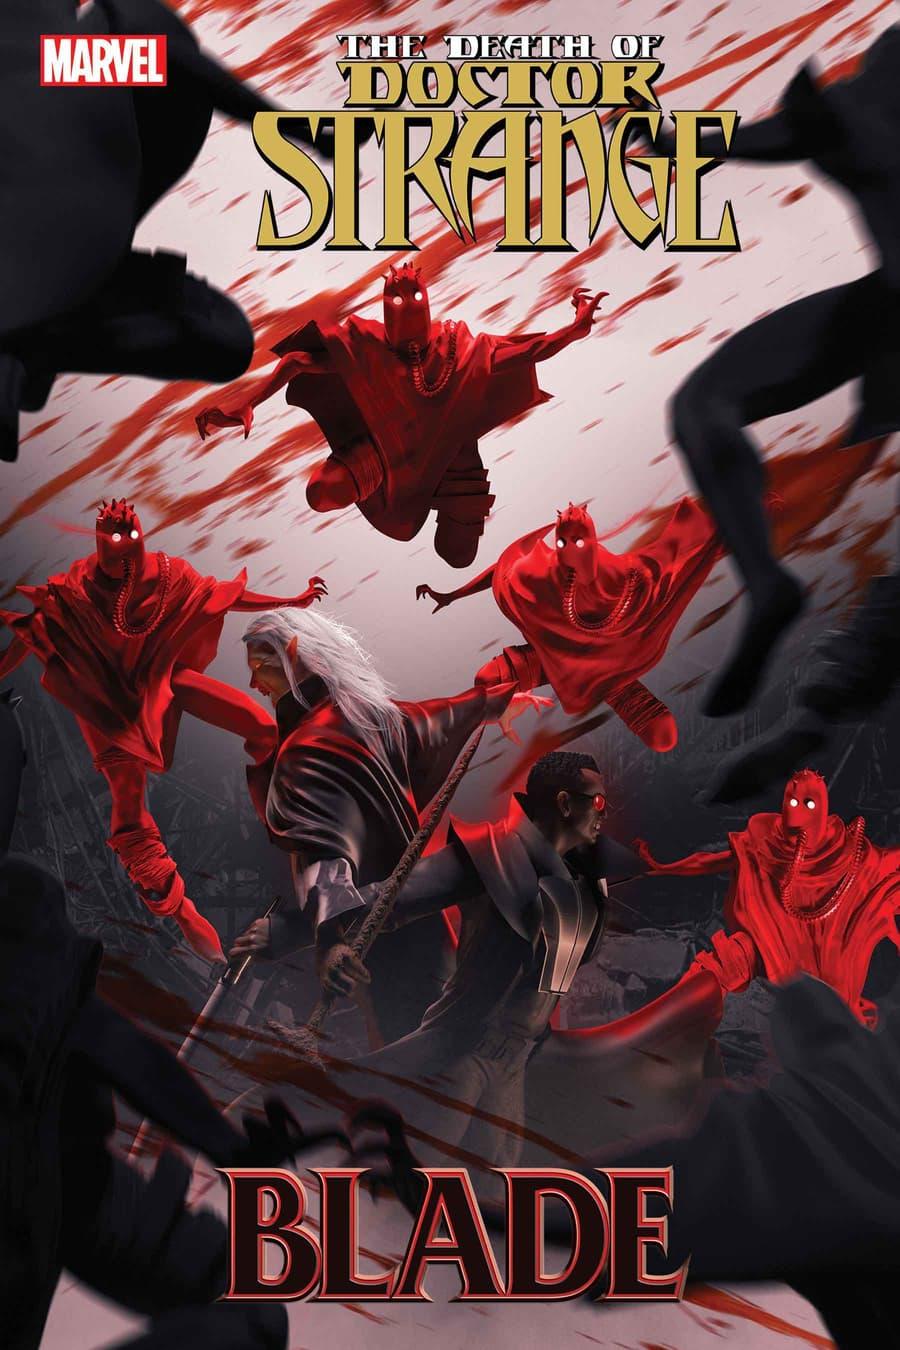 DEATH OF DOCTOR STRANGE: BLADE #1 cover by BossLogic